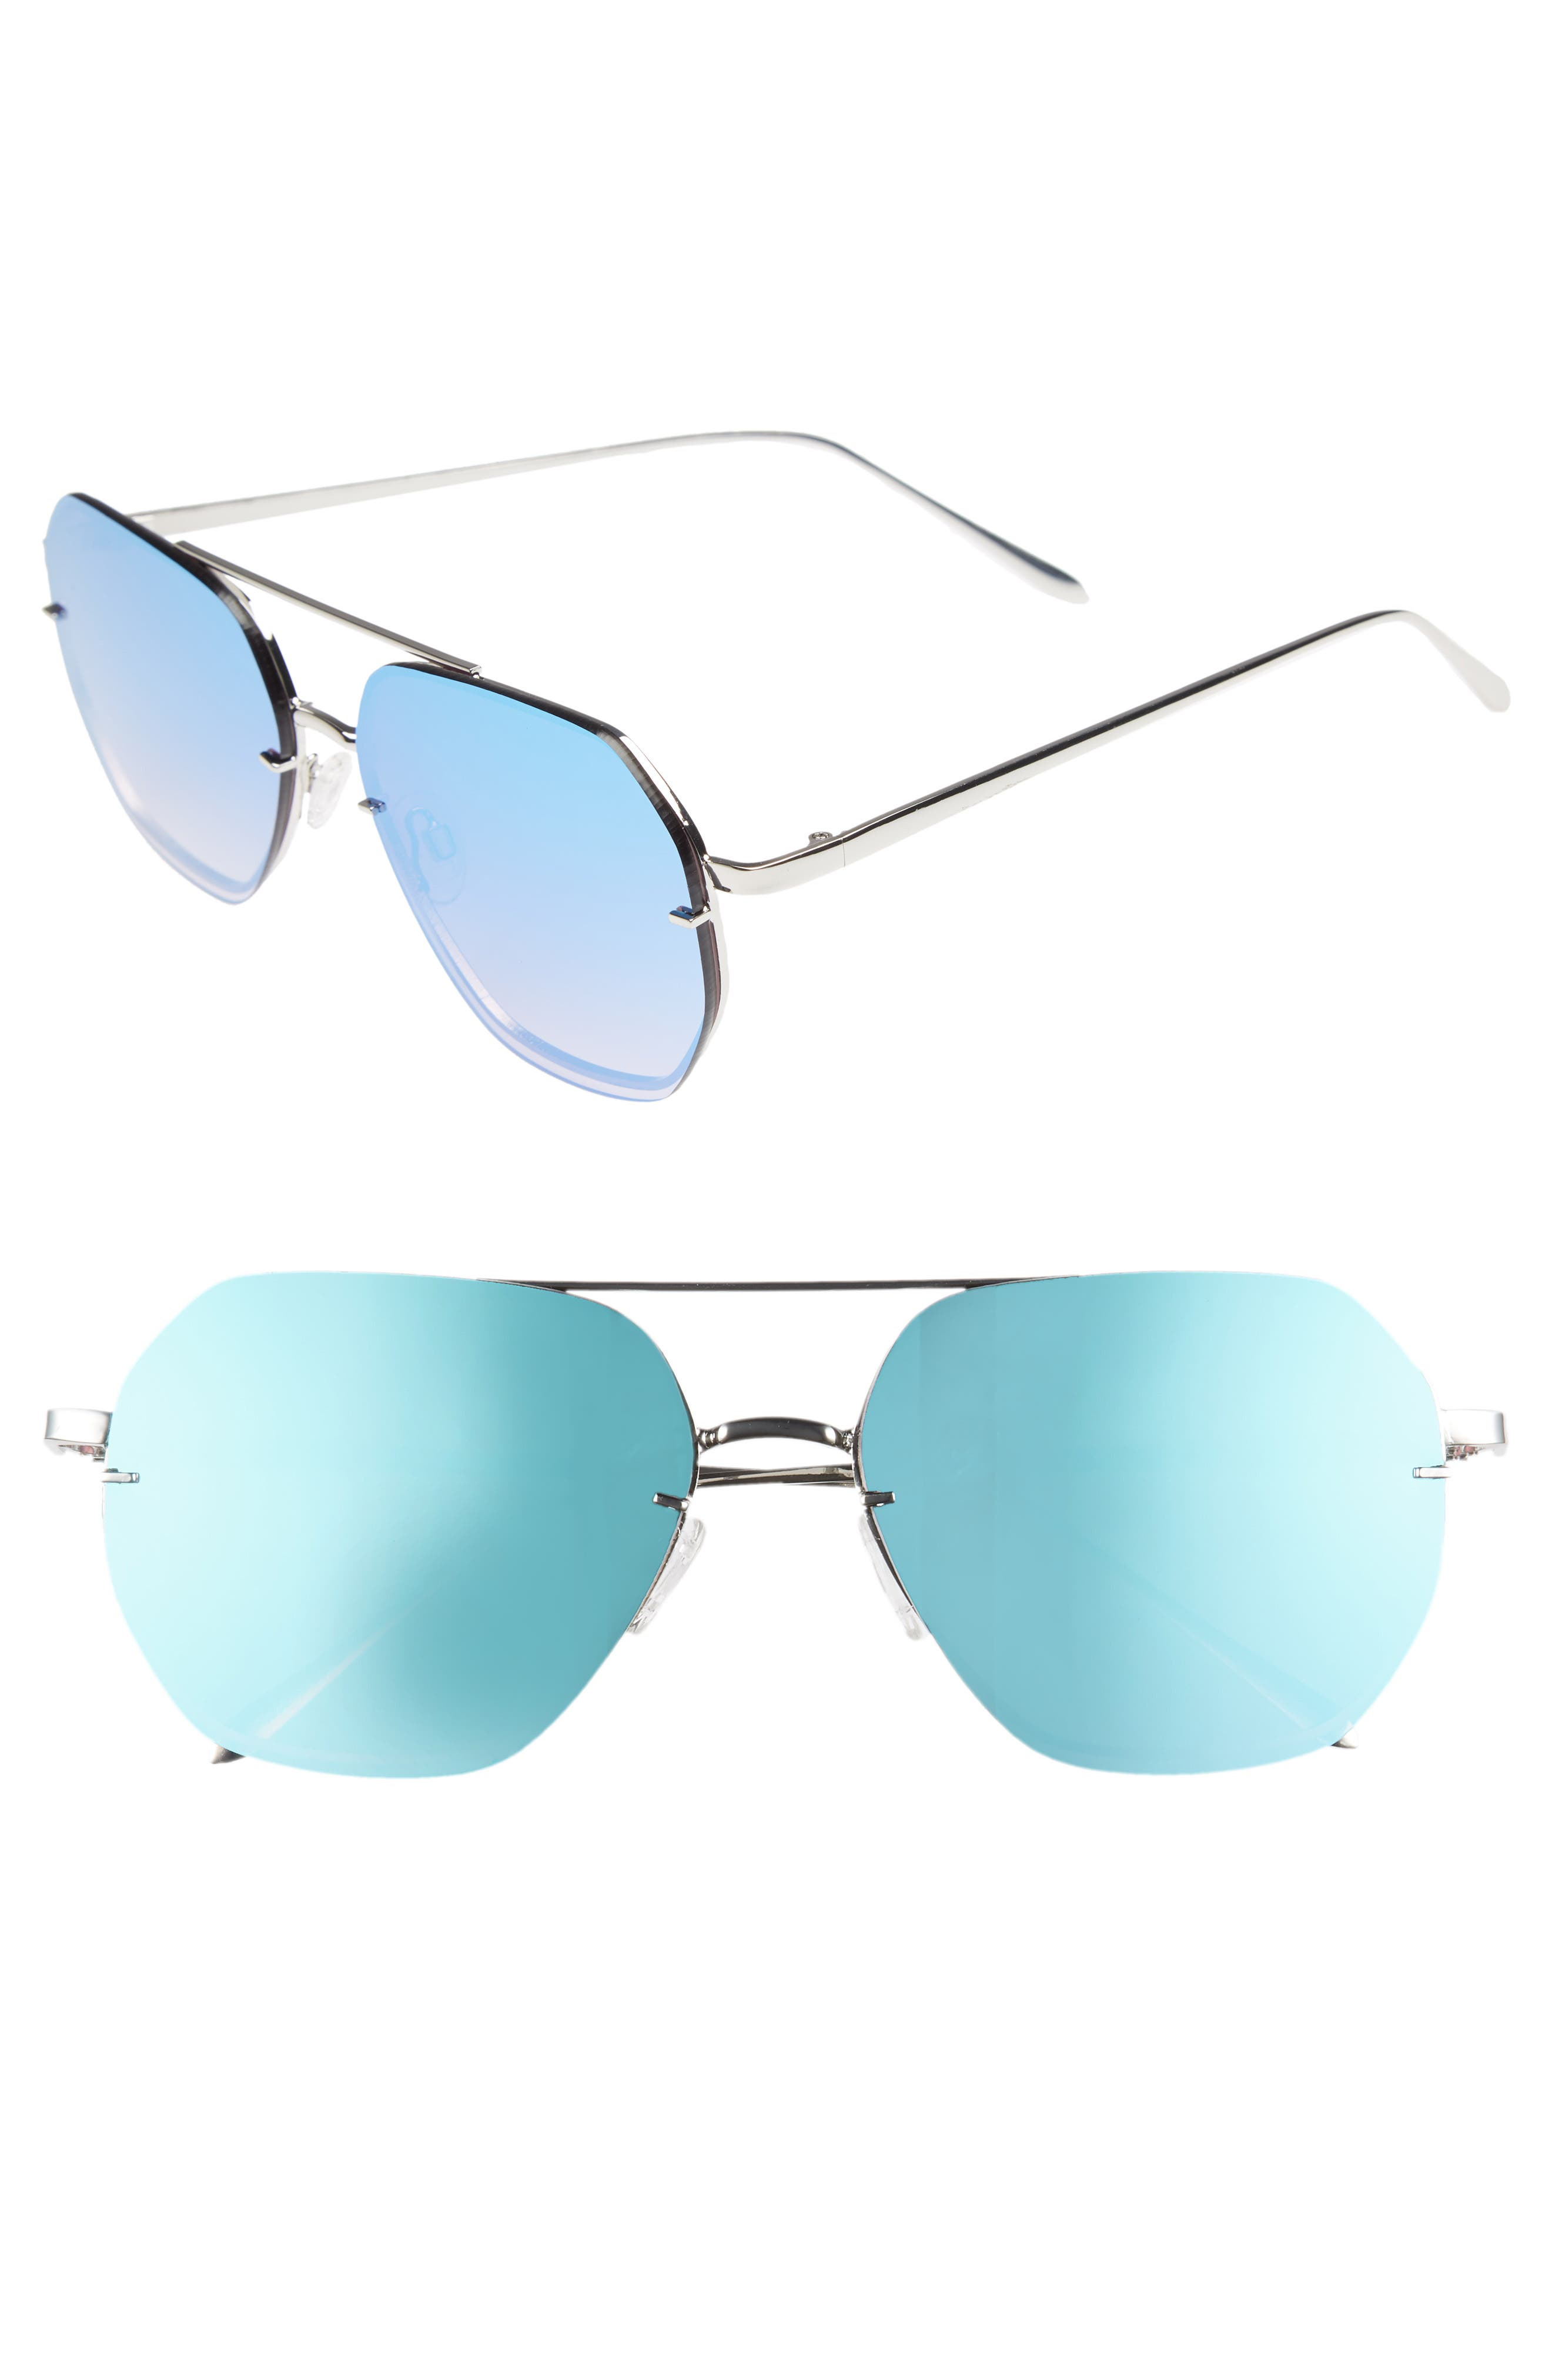 62mm Metal Flat Geo Aviator Sunglasses,                             Main thumbnail 1, color,                             040